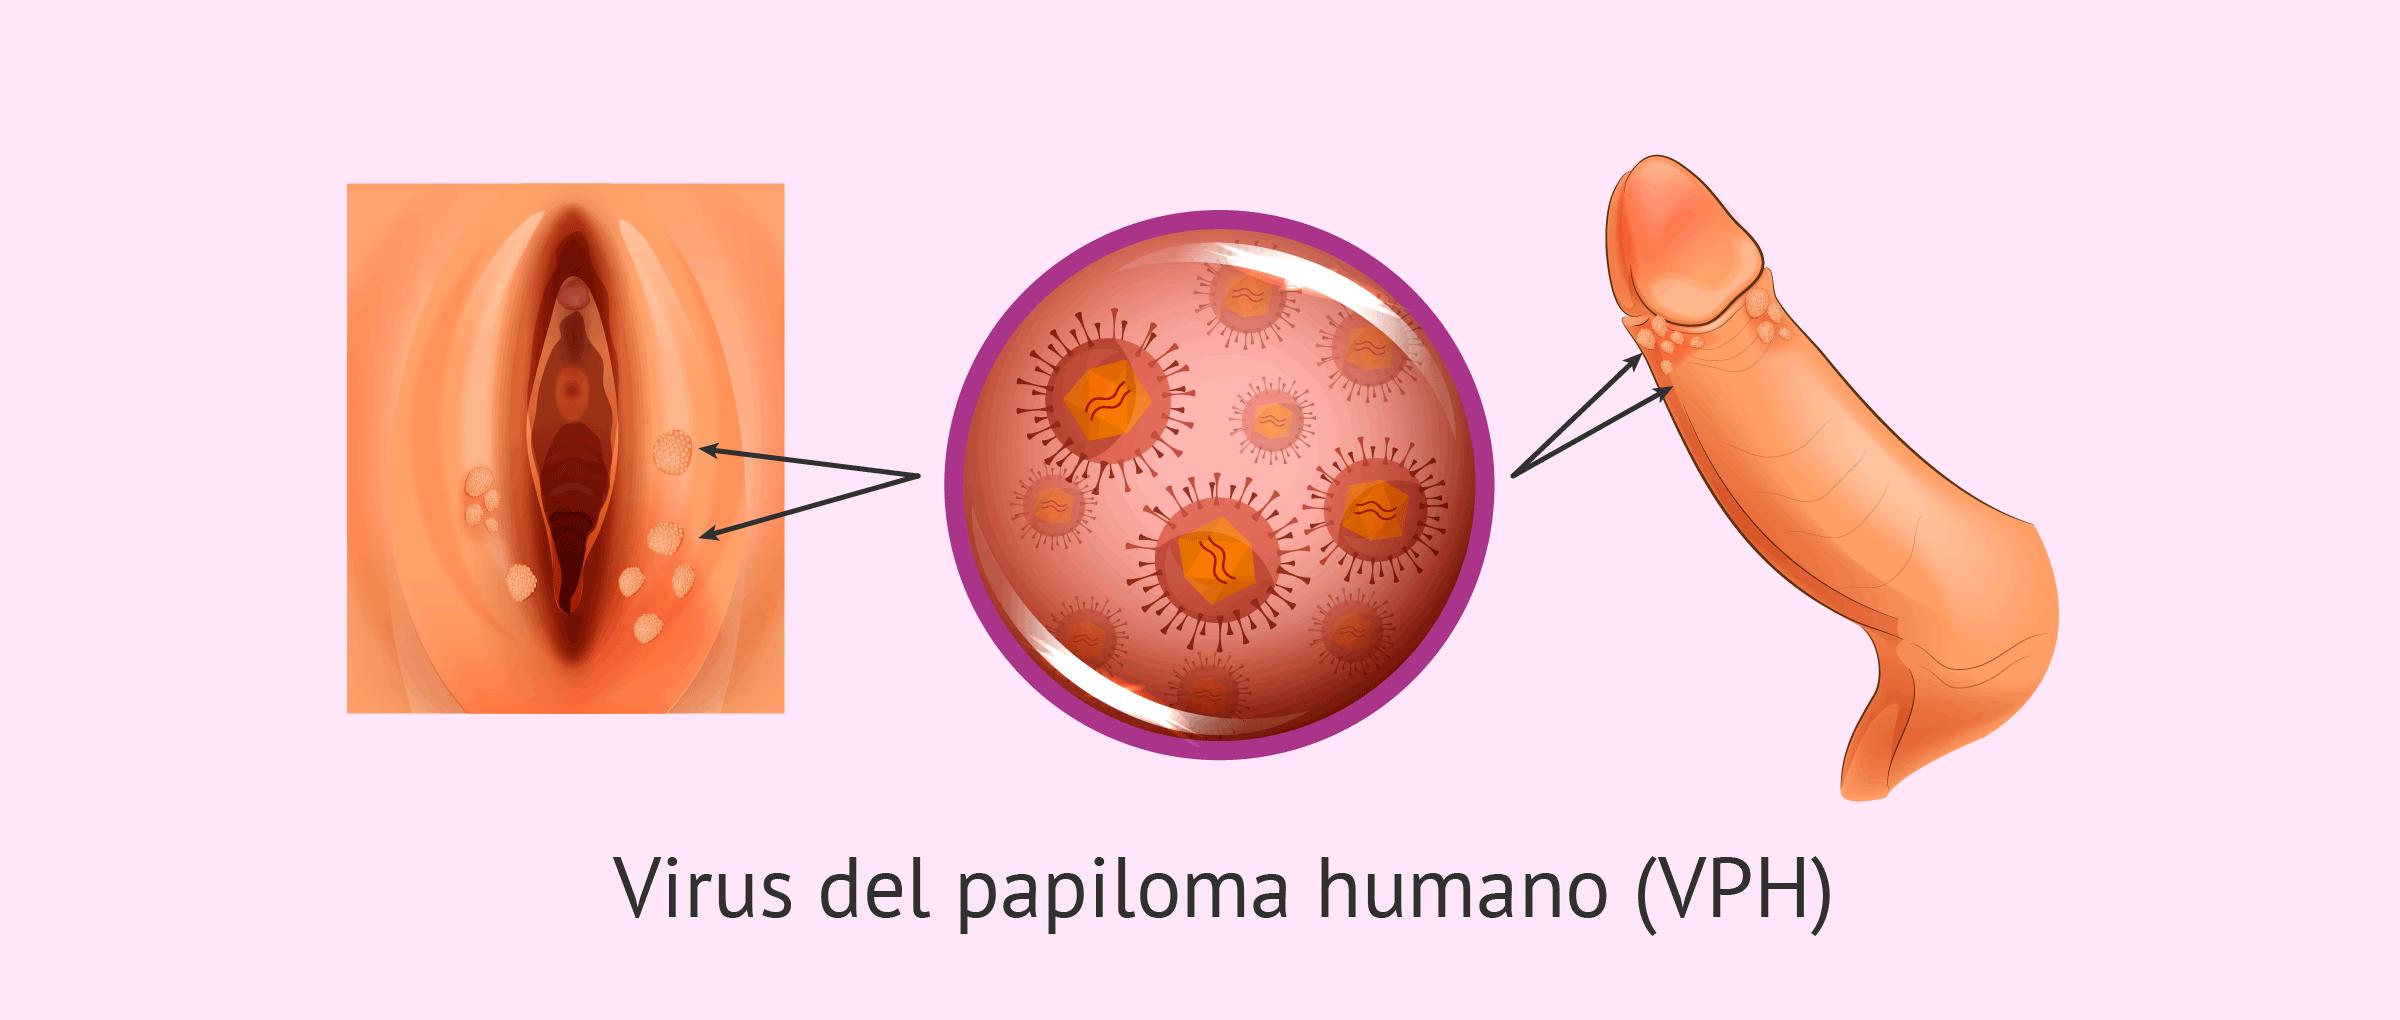 que es el papiloma humano imagenes virusi rusia